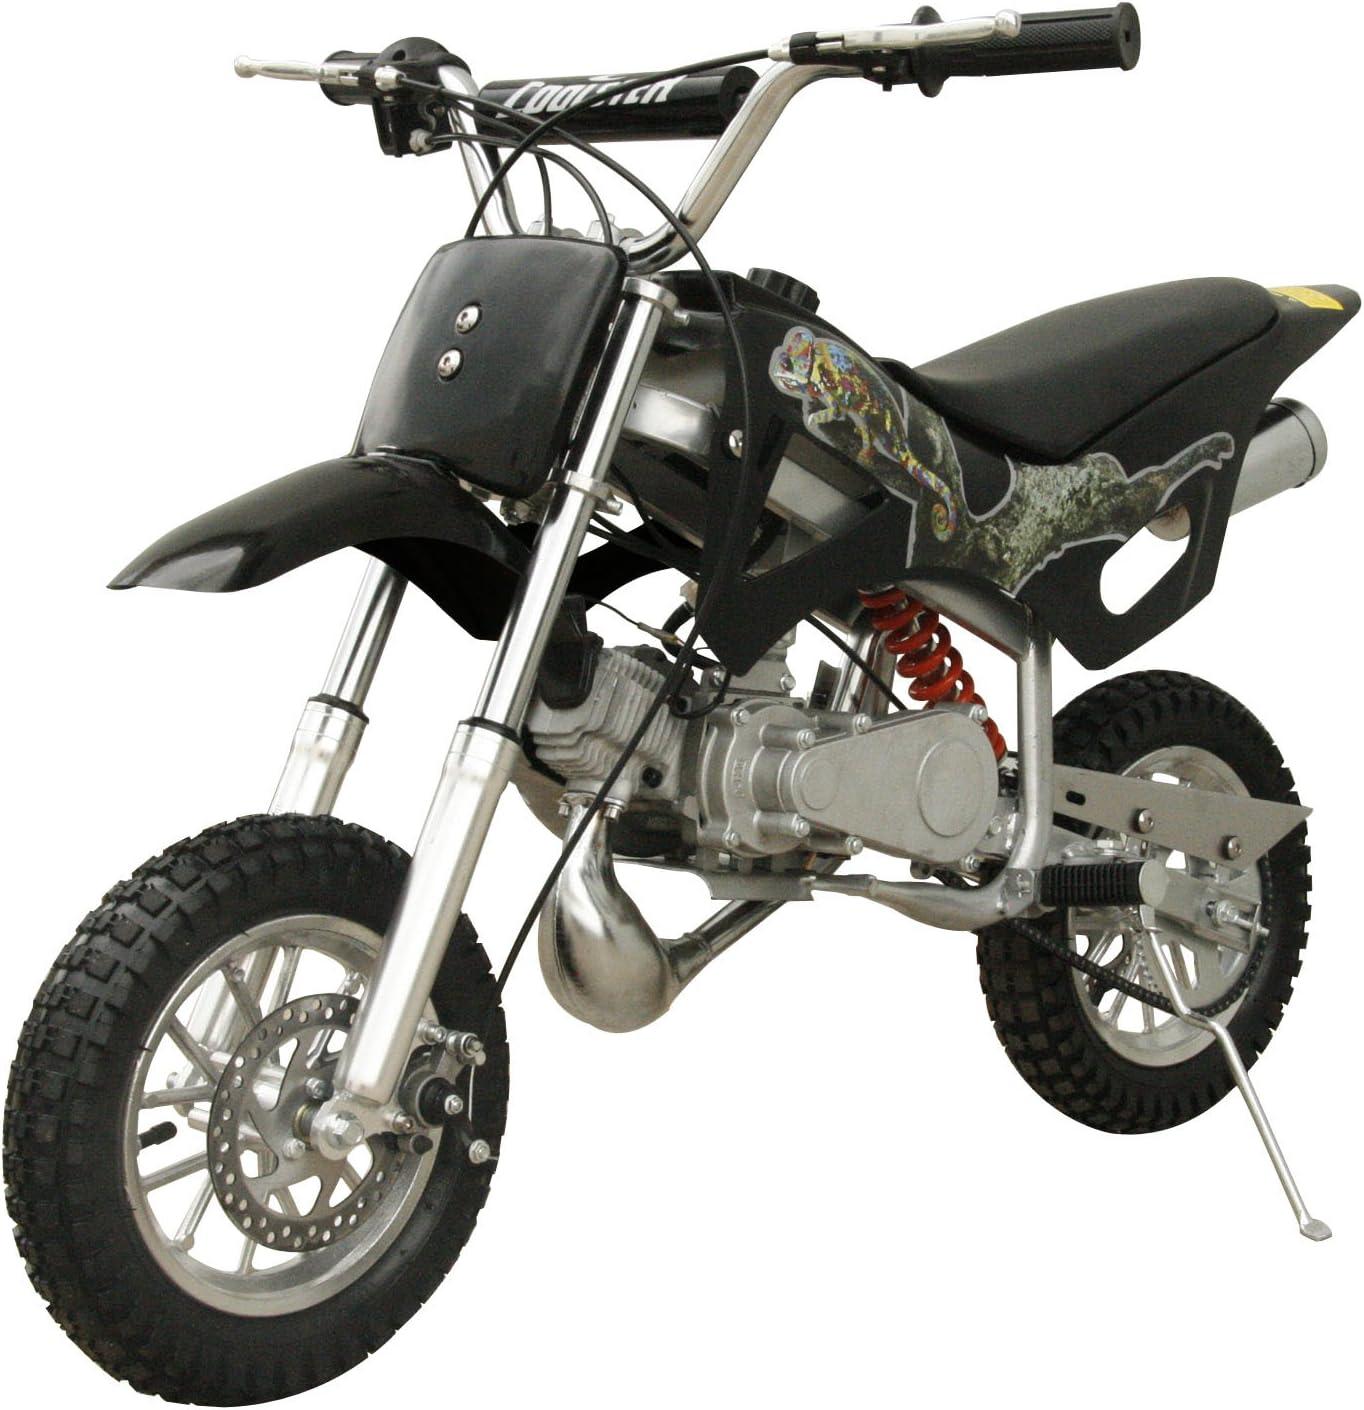 Flying Horse Mini Dirt Bike Motorcycle